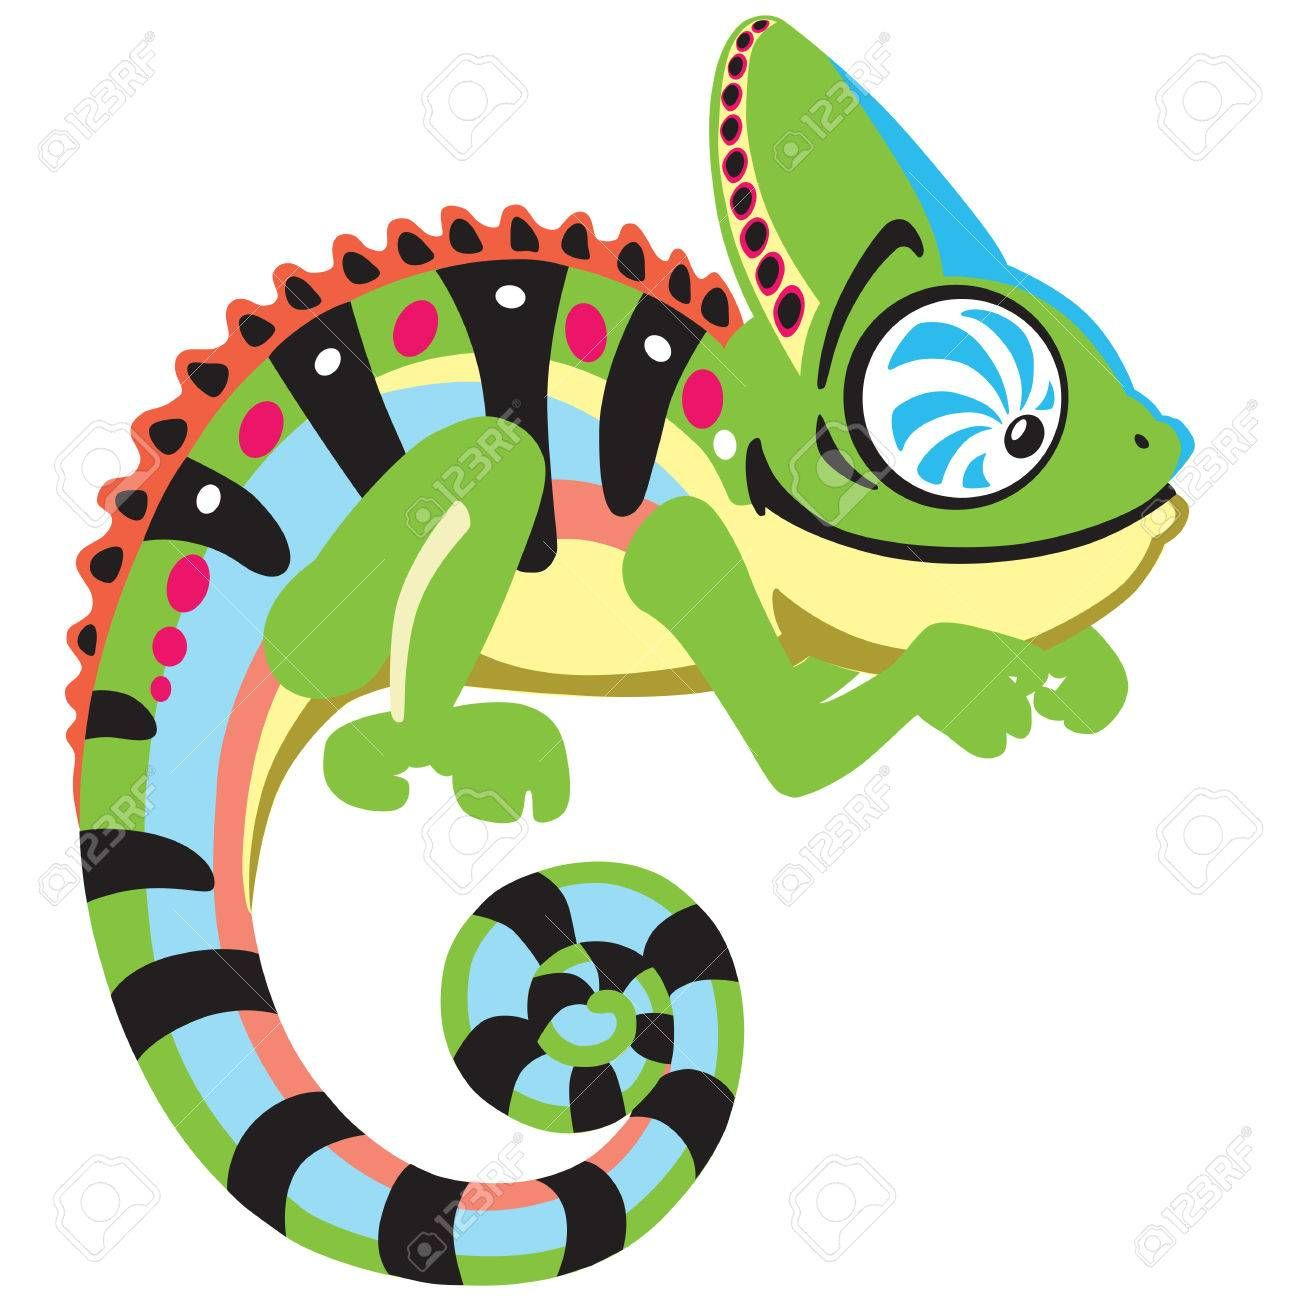 Cartoon Chameleon Lizard Side View Image Isolated On White Sponsored Lizard Side Cartoon Chamel Dibujos De Lagartijas Tatuaje De Camaleon Camaleon